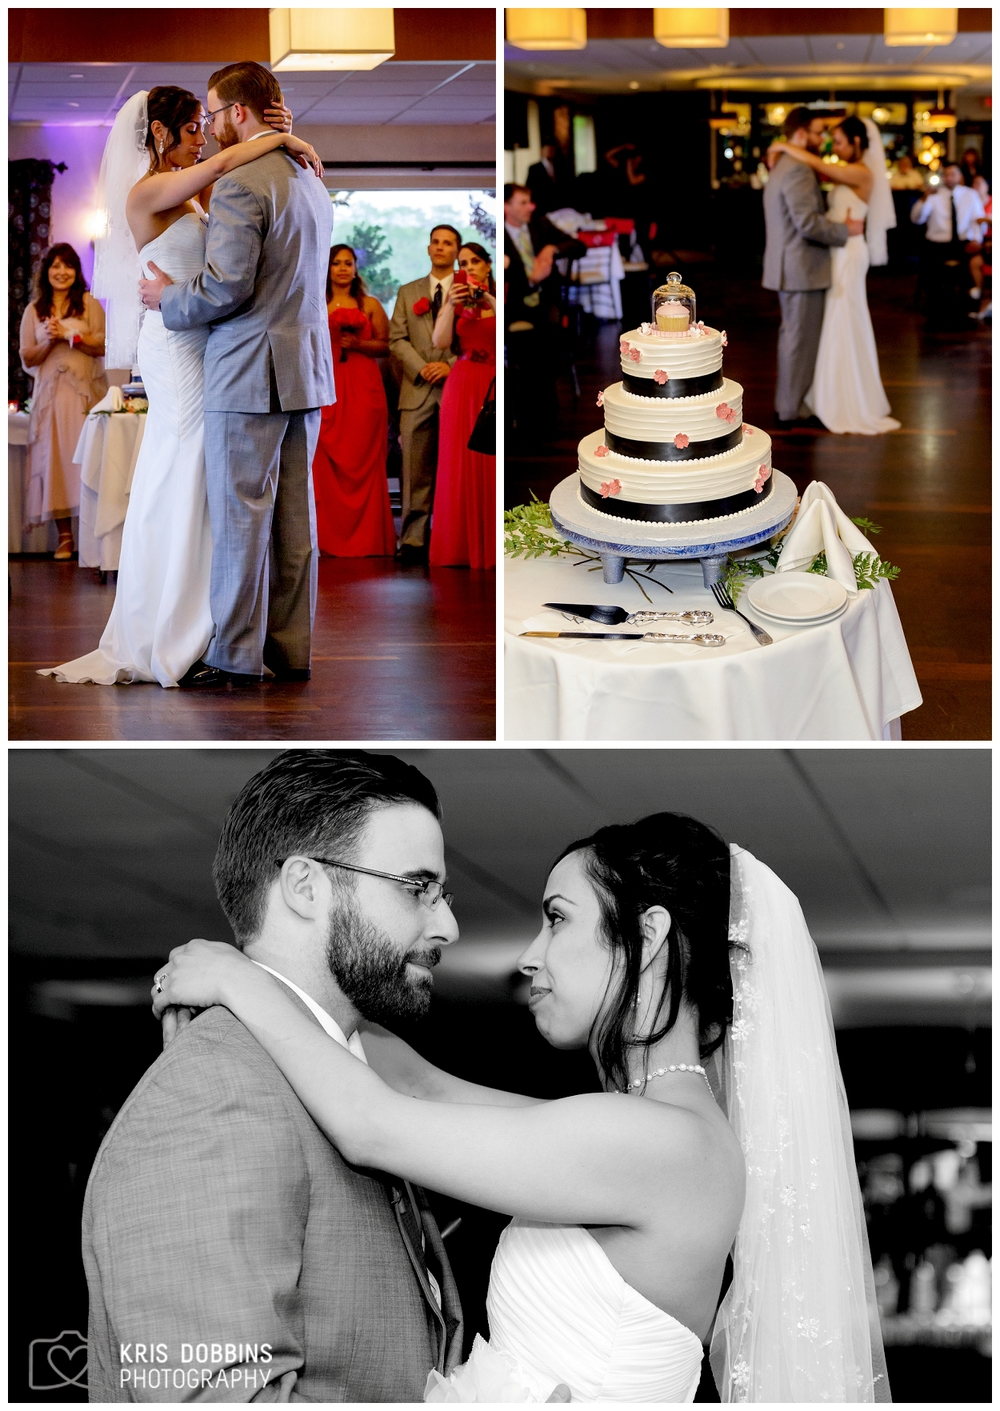 kdp_copyrighted_wedding_blog_bd_image_0026.jpg